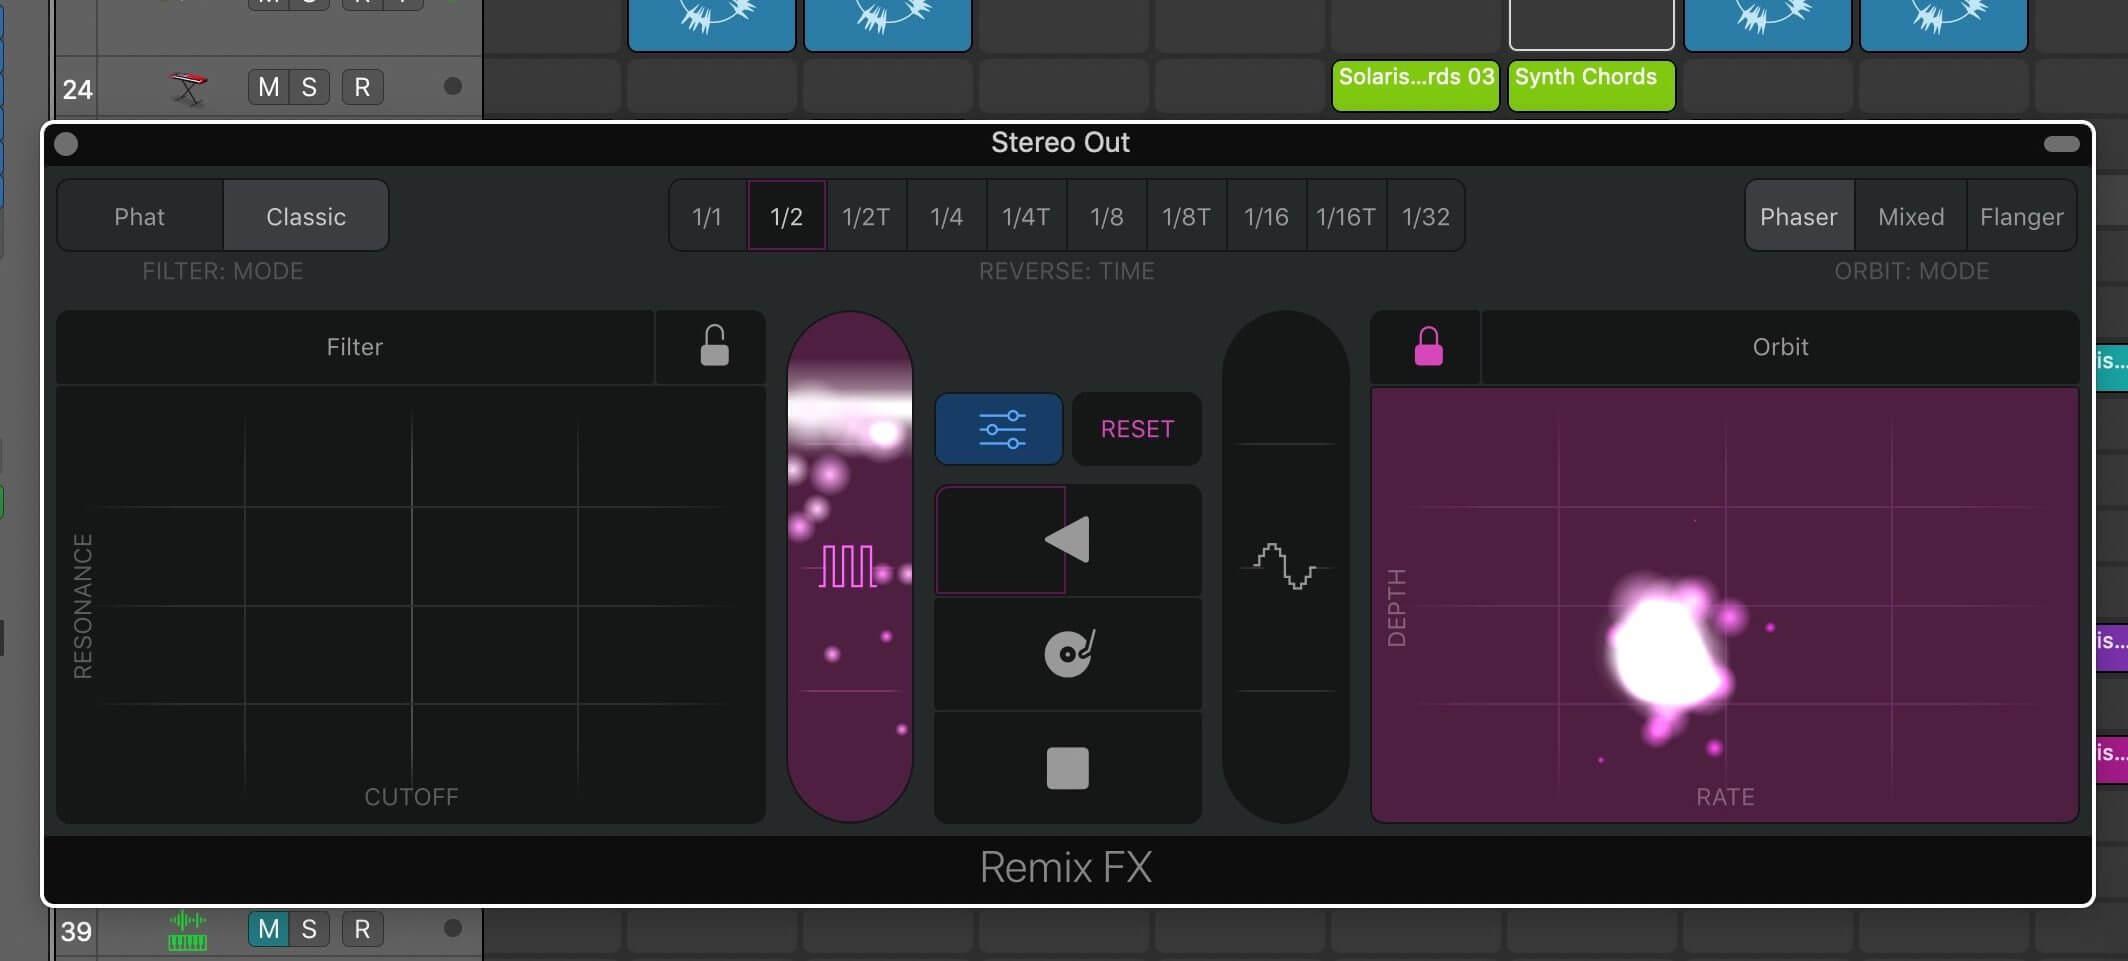 Запись исполнения Remix FX в Logic Pro X 10.5